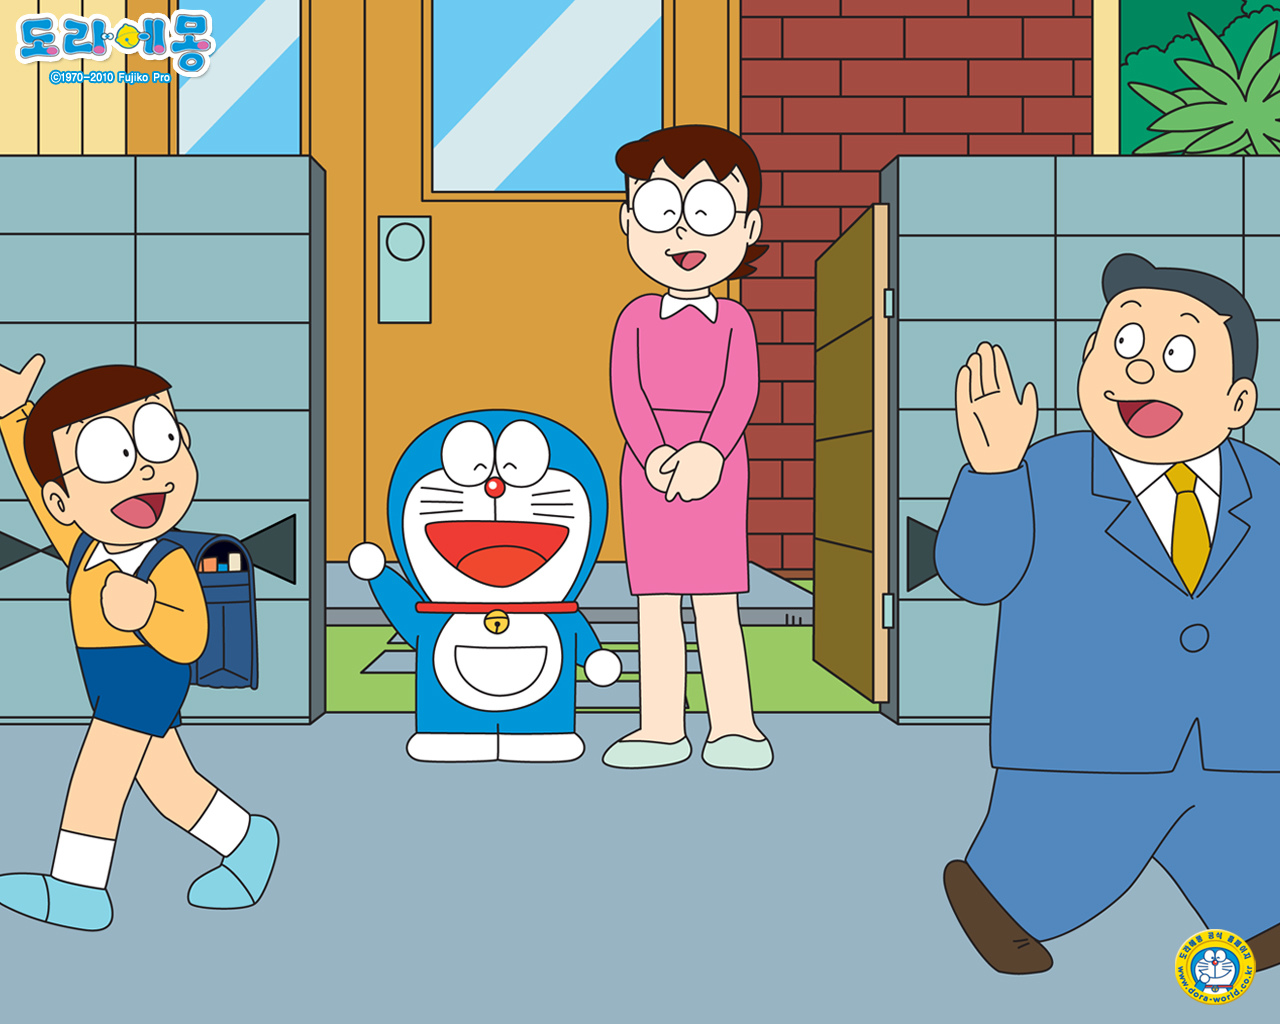 Red Dead Redemption Wallpaper Hd Fondos De Pantalla De Doraemon Wallpapers Hd Gratis